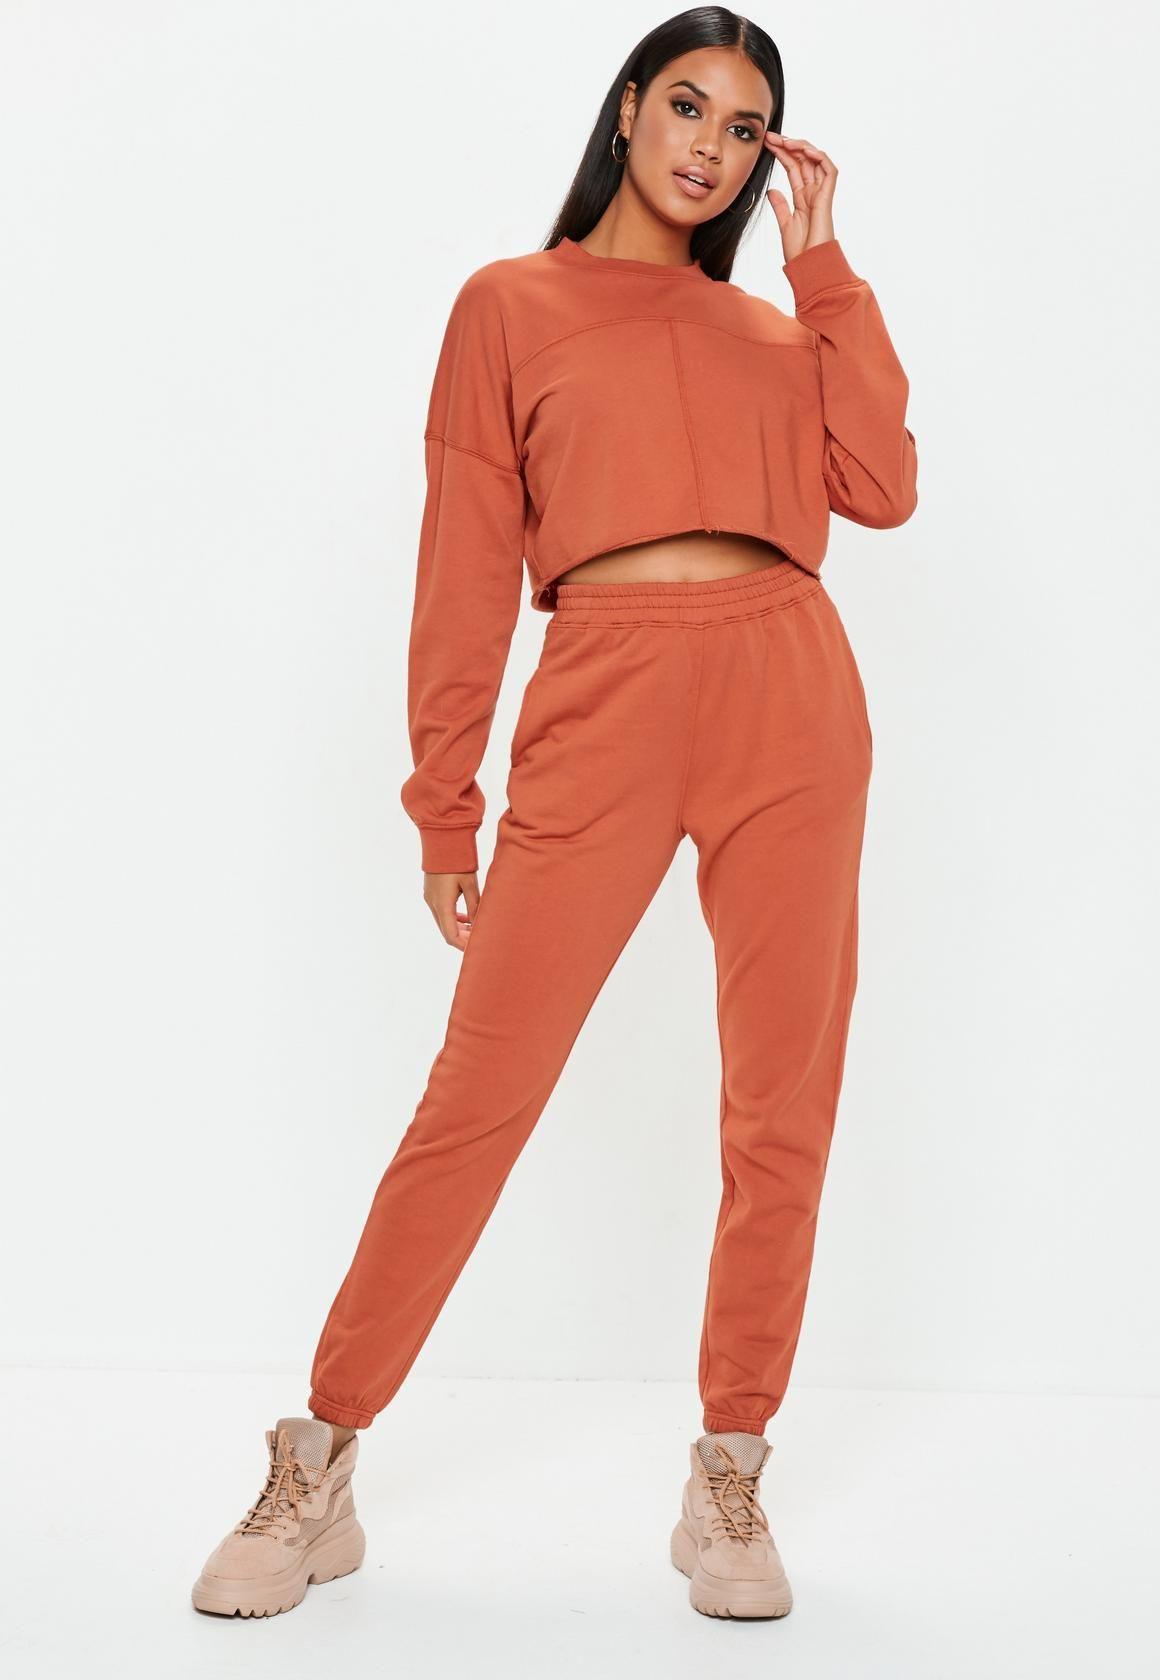 b6fde2940d2f Rust Slim Leg Joggers in 2019 | My Style | Slim legs, Trouser pants ...